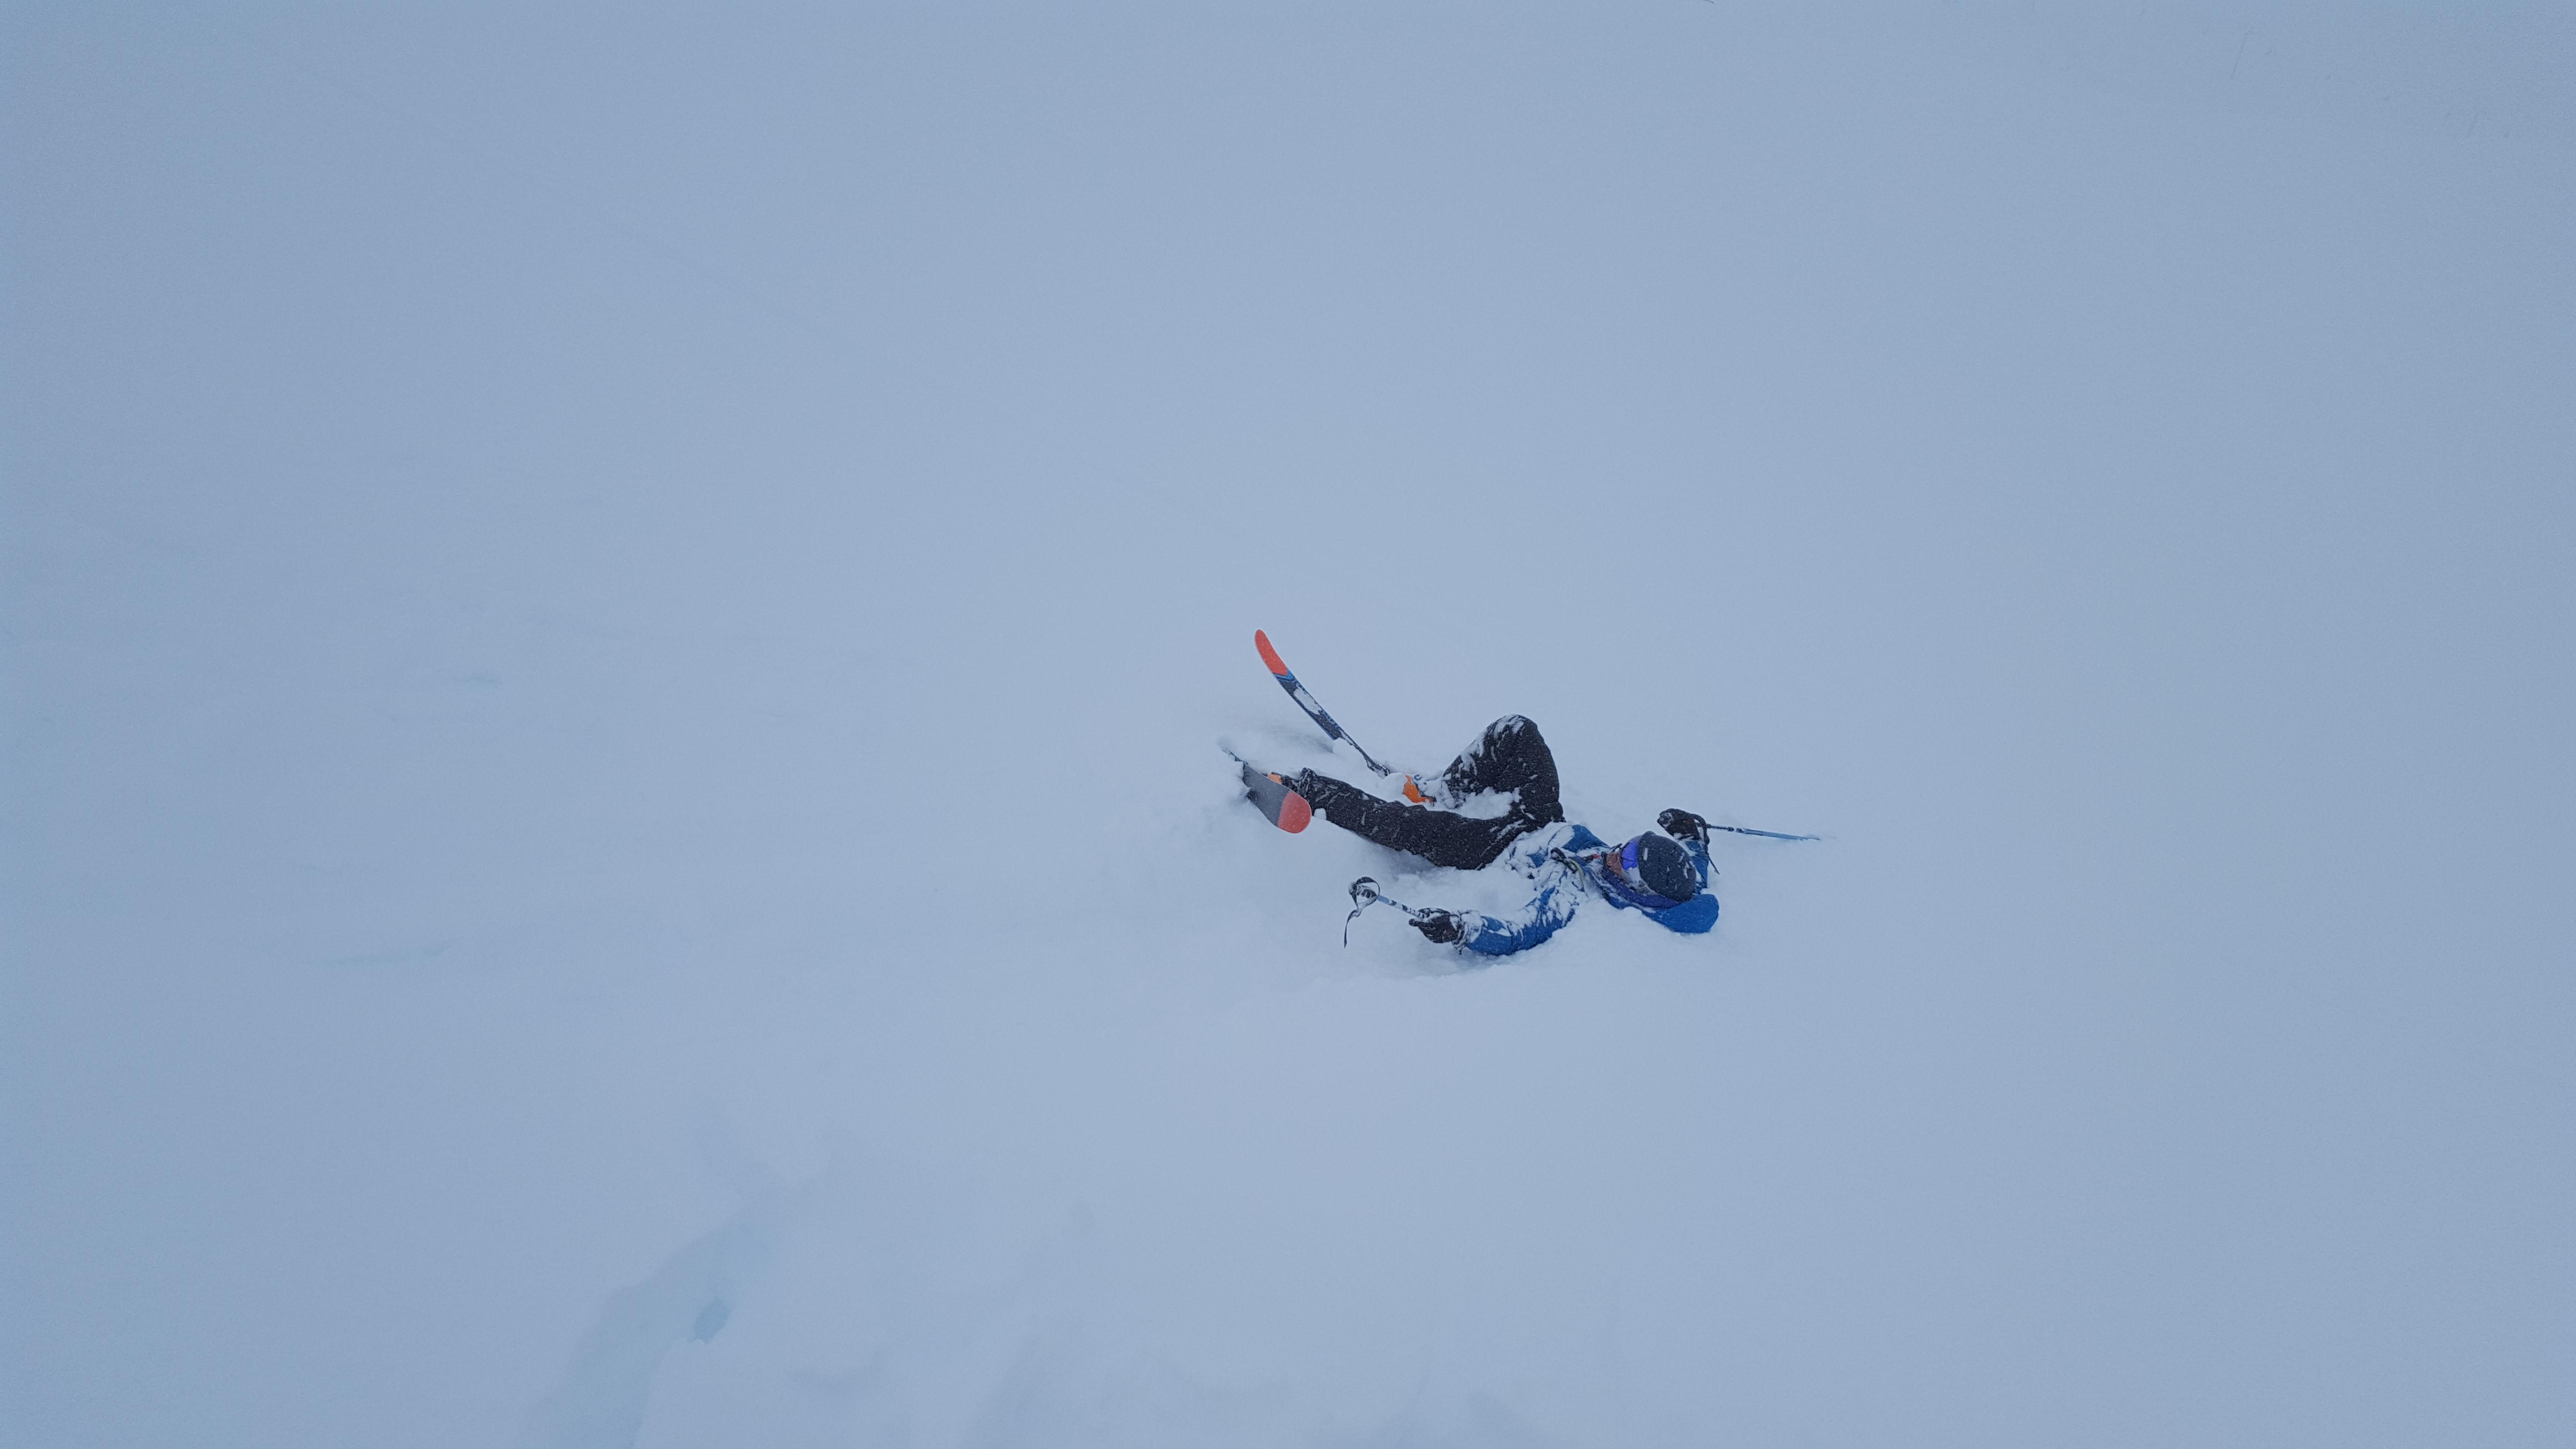 Powder day crash Mt Hutt New Zealand